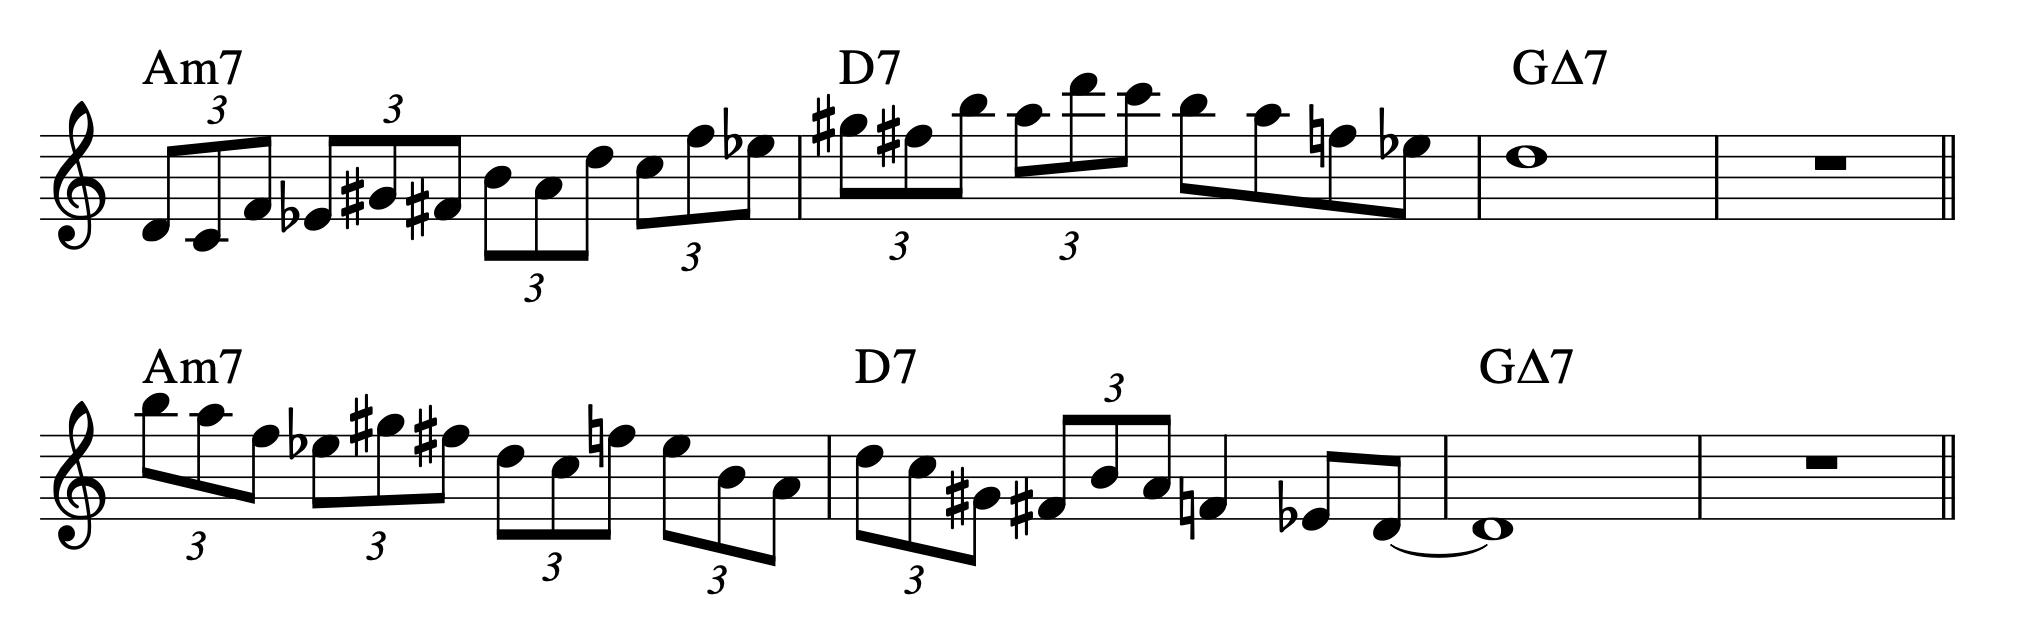 diminish-phrase-3